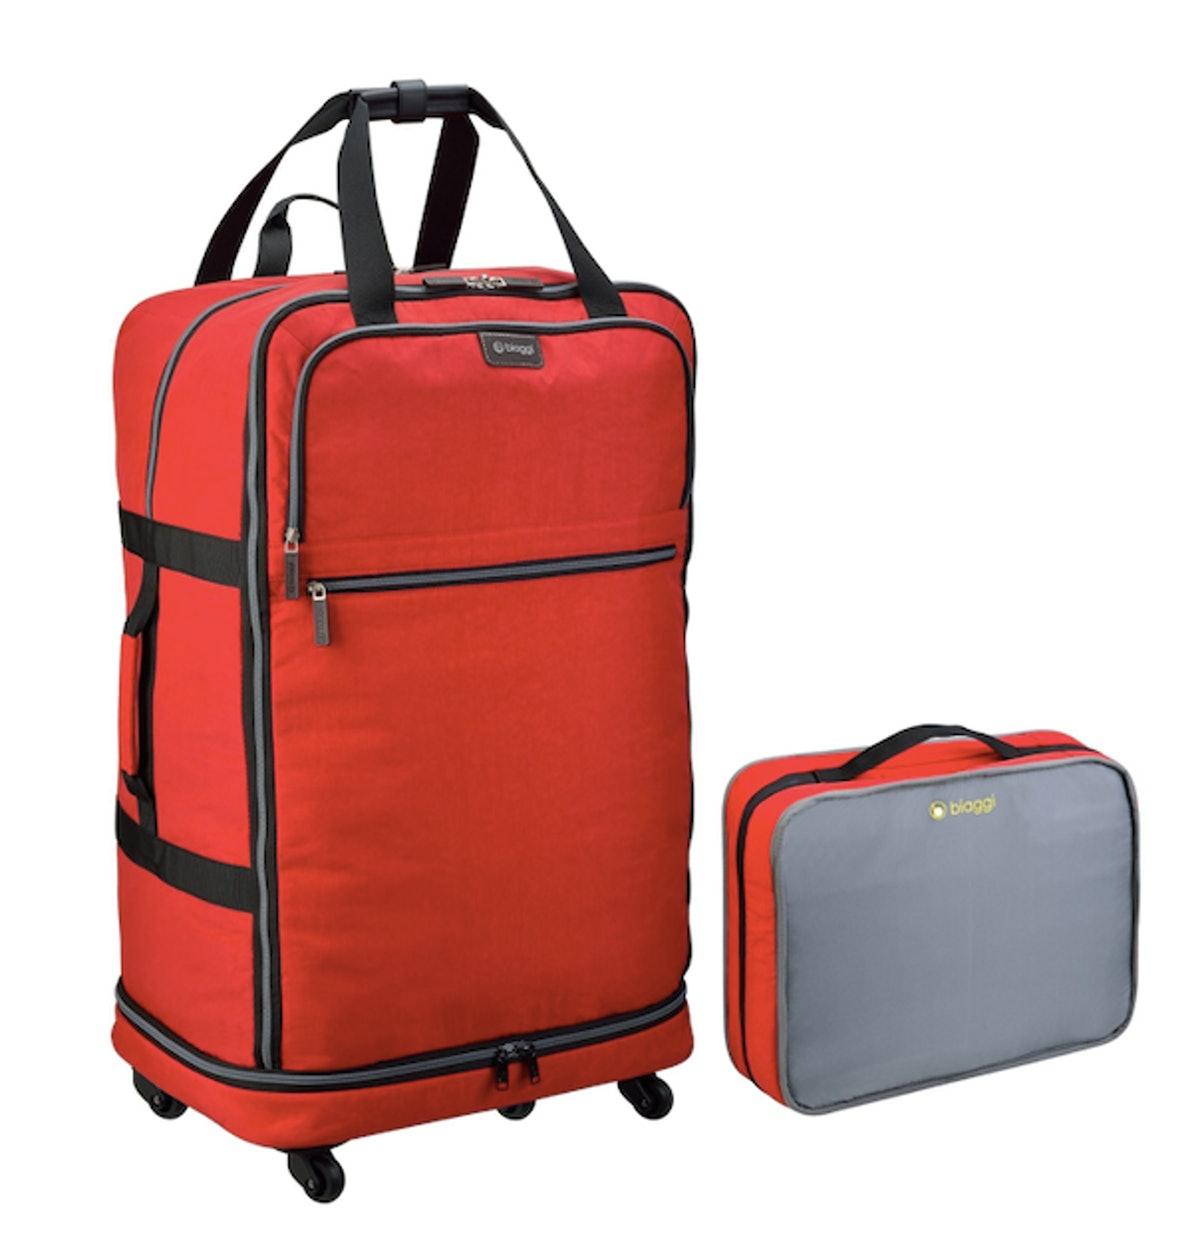 Biaggi Zipsak Microfold Suitcase